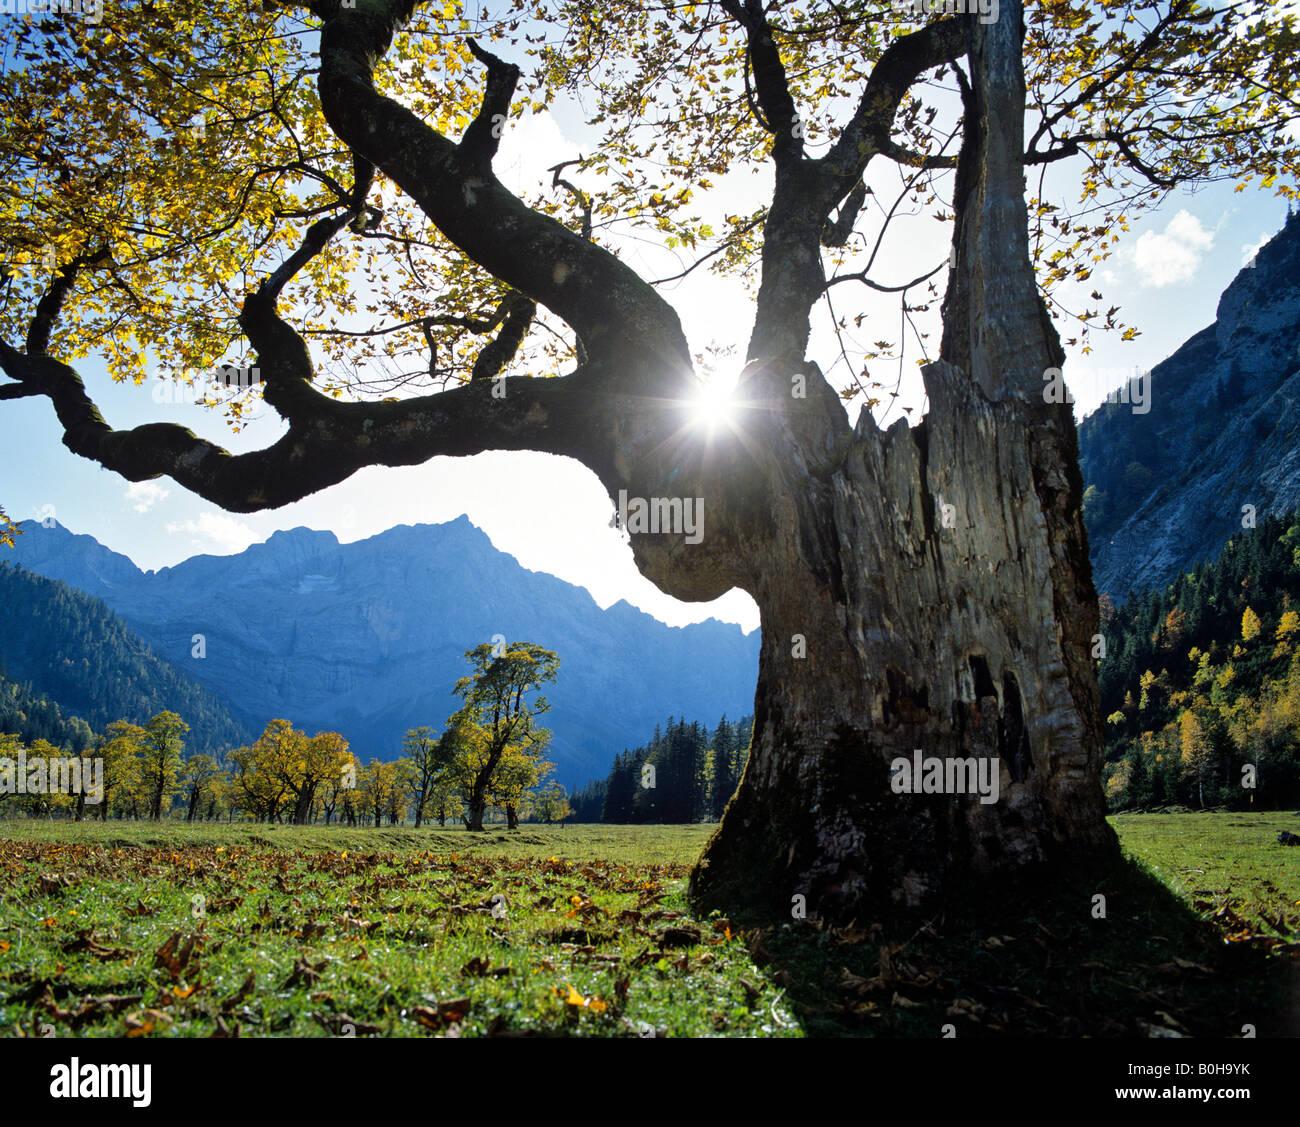 Grosser Ahornboden, autumn, Mt. Spritzkarspitze, Eiskarln, Karwendel Range, Tirol, Austria - Stock Image